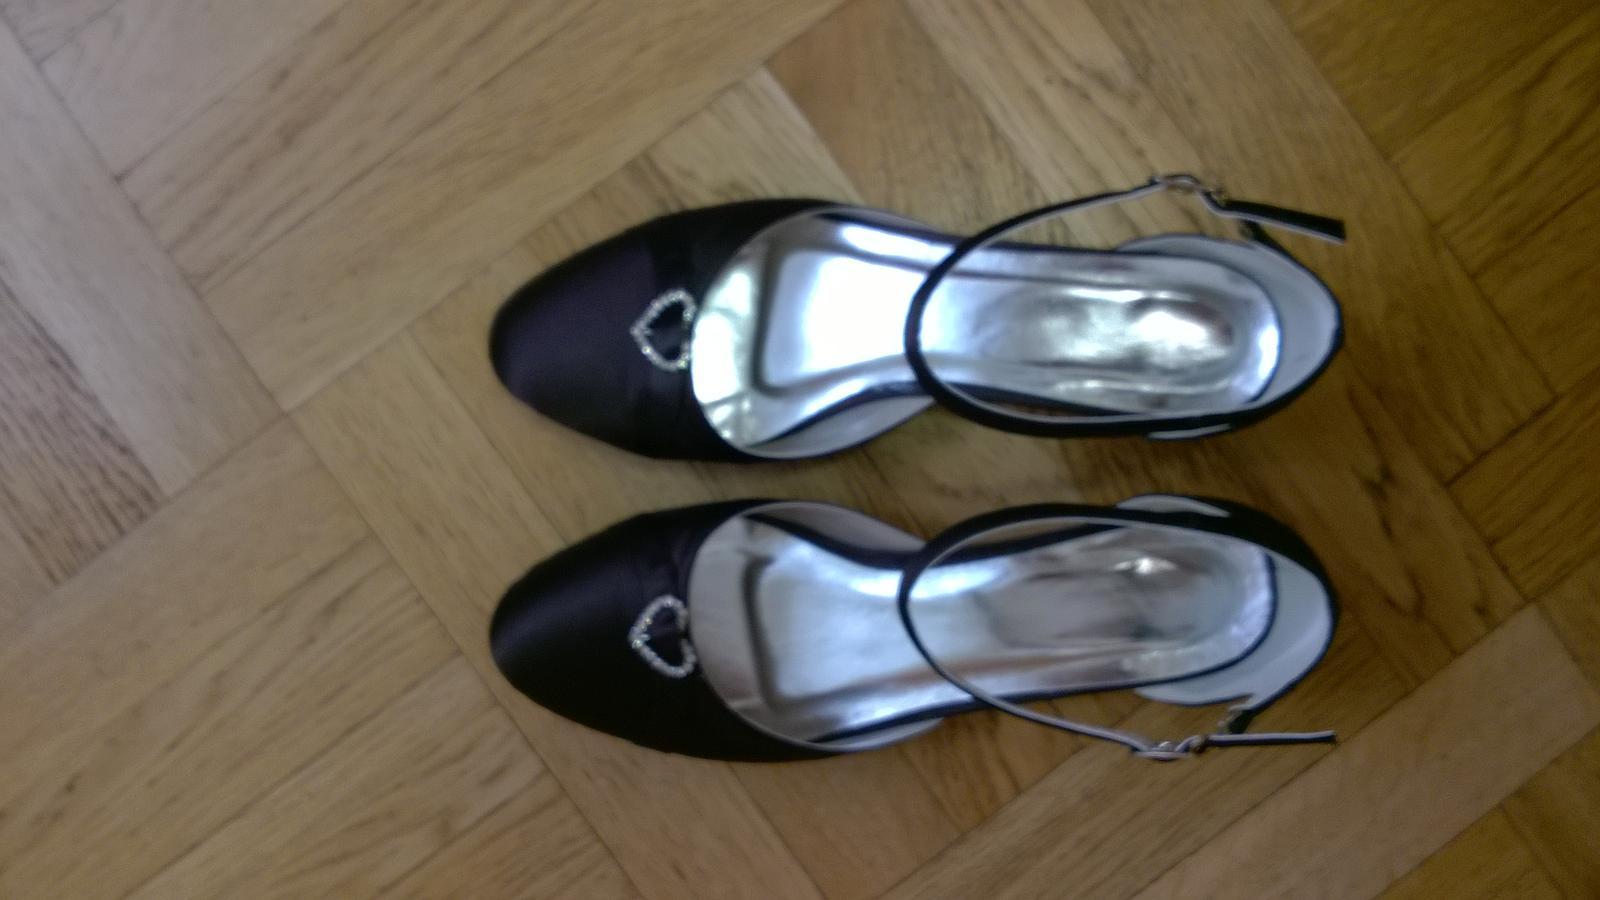 bb04c305ae4 Pohodlná společenská obuv vhodná na ples či svatbu